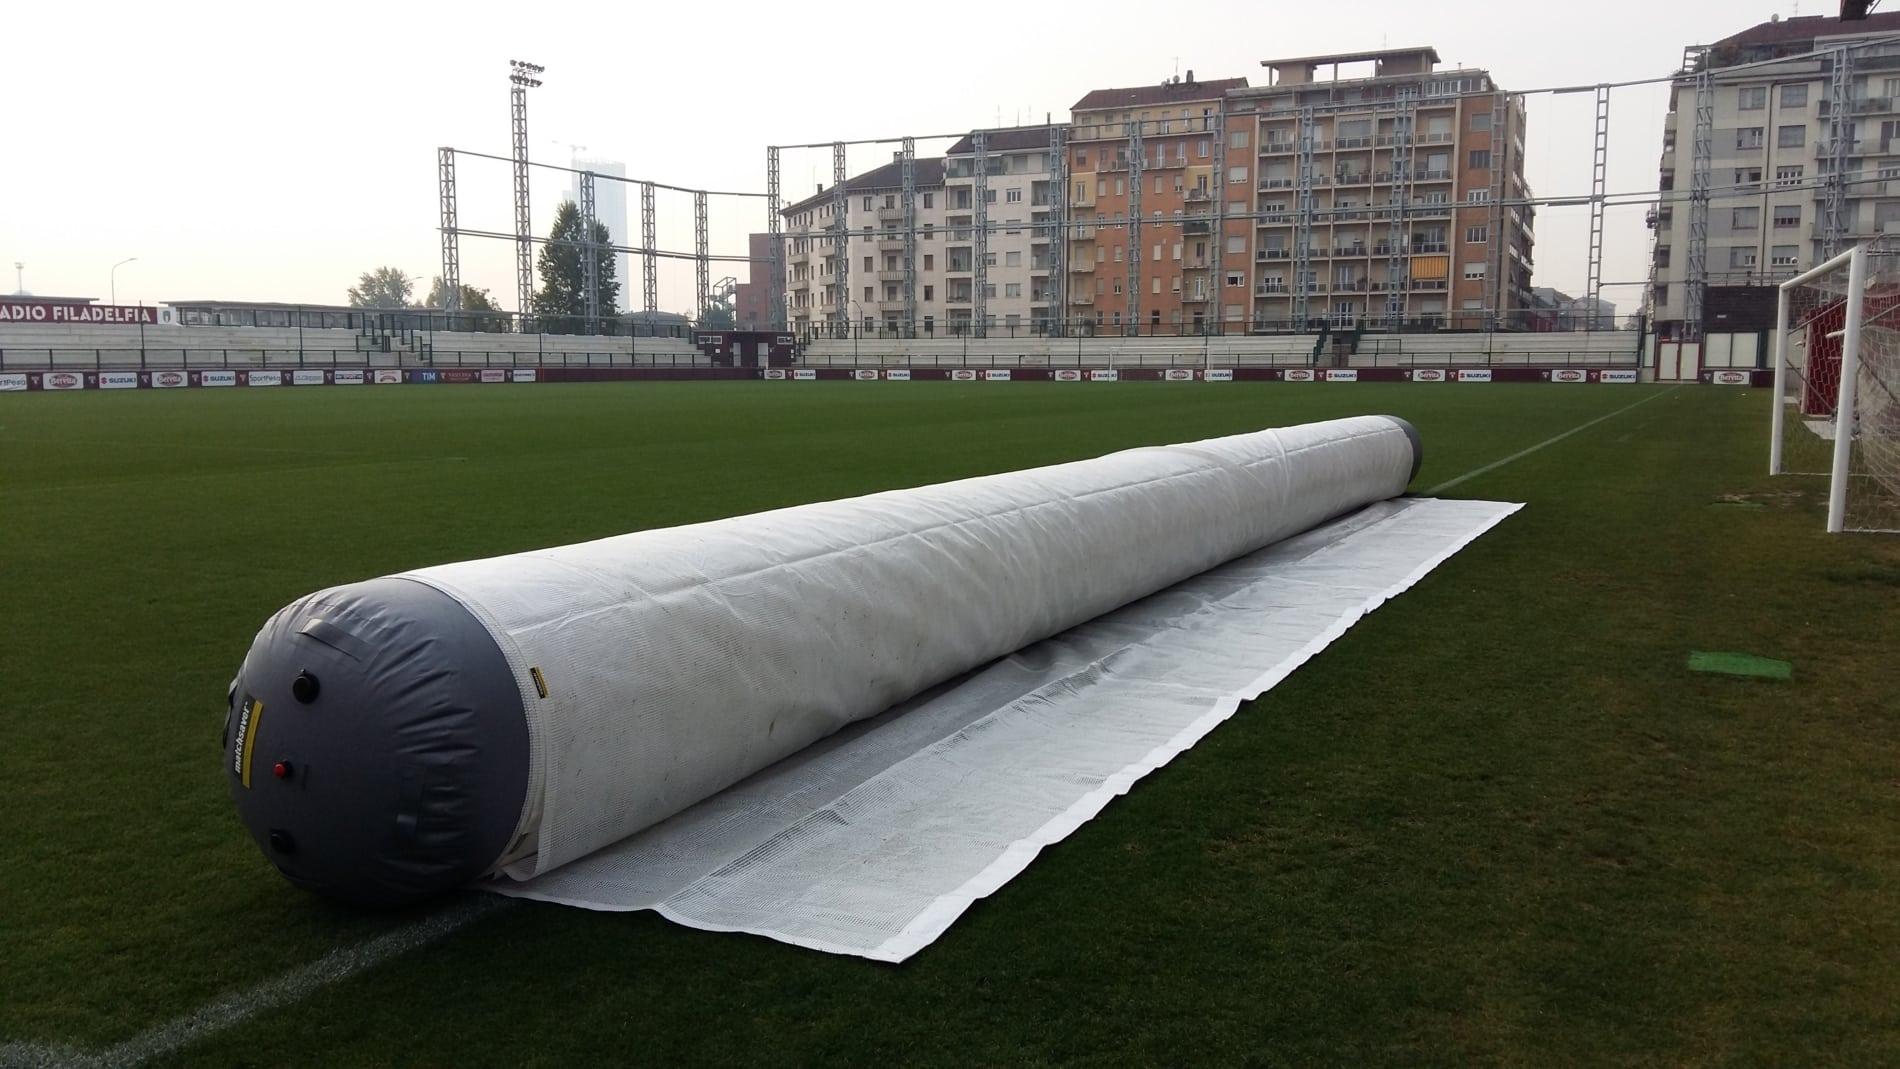 Torino Training Ground, Matchsaver Air Roller Covers